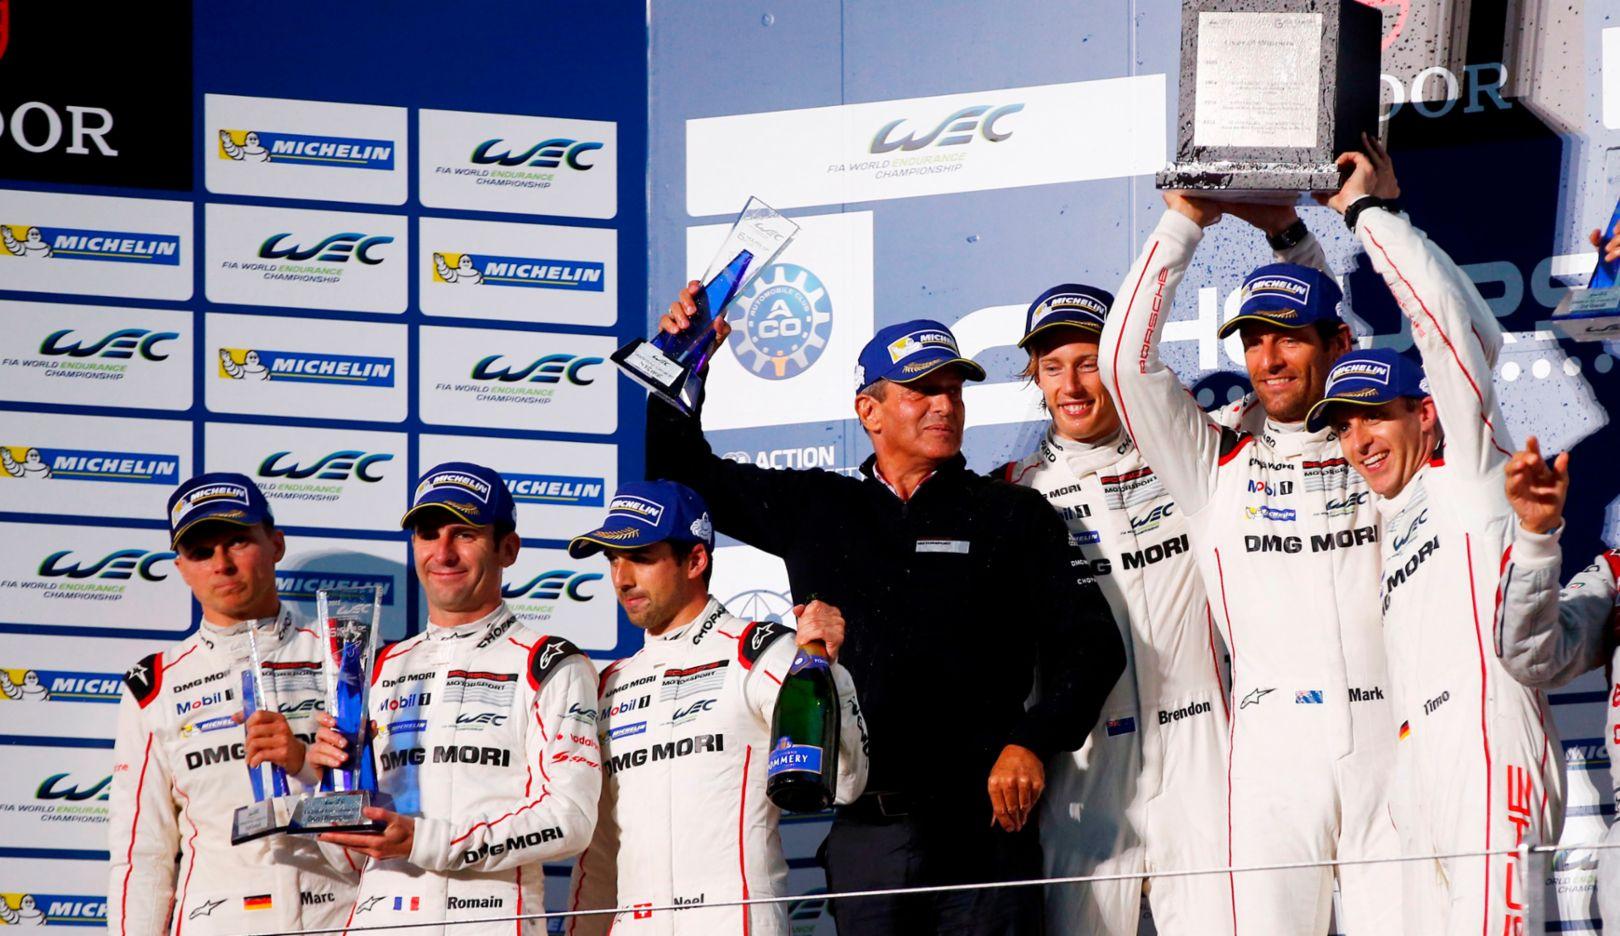 Marc Lieb, Romain Dumas, Neel Jani, Fritz Enzinger, Brendon Hartley, Mark Webber, Timo Bernhard (l-r), FIA WEC, Fuji 2015, Porsche AG